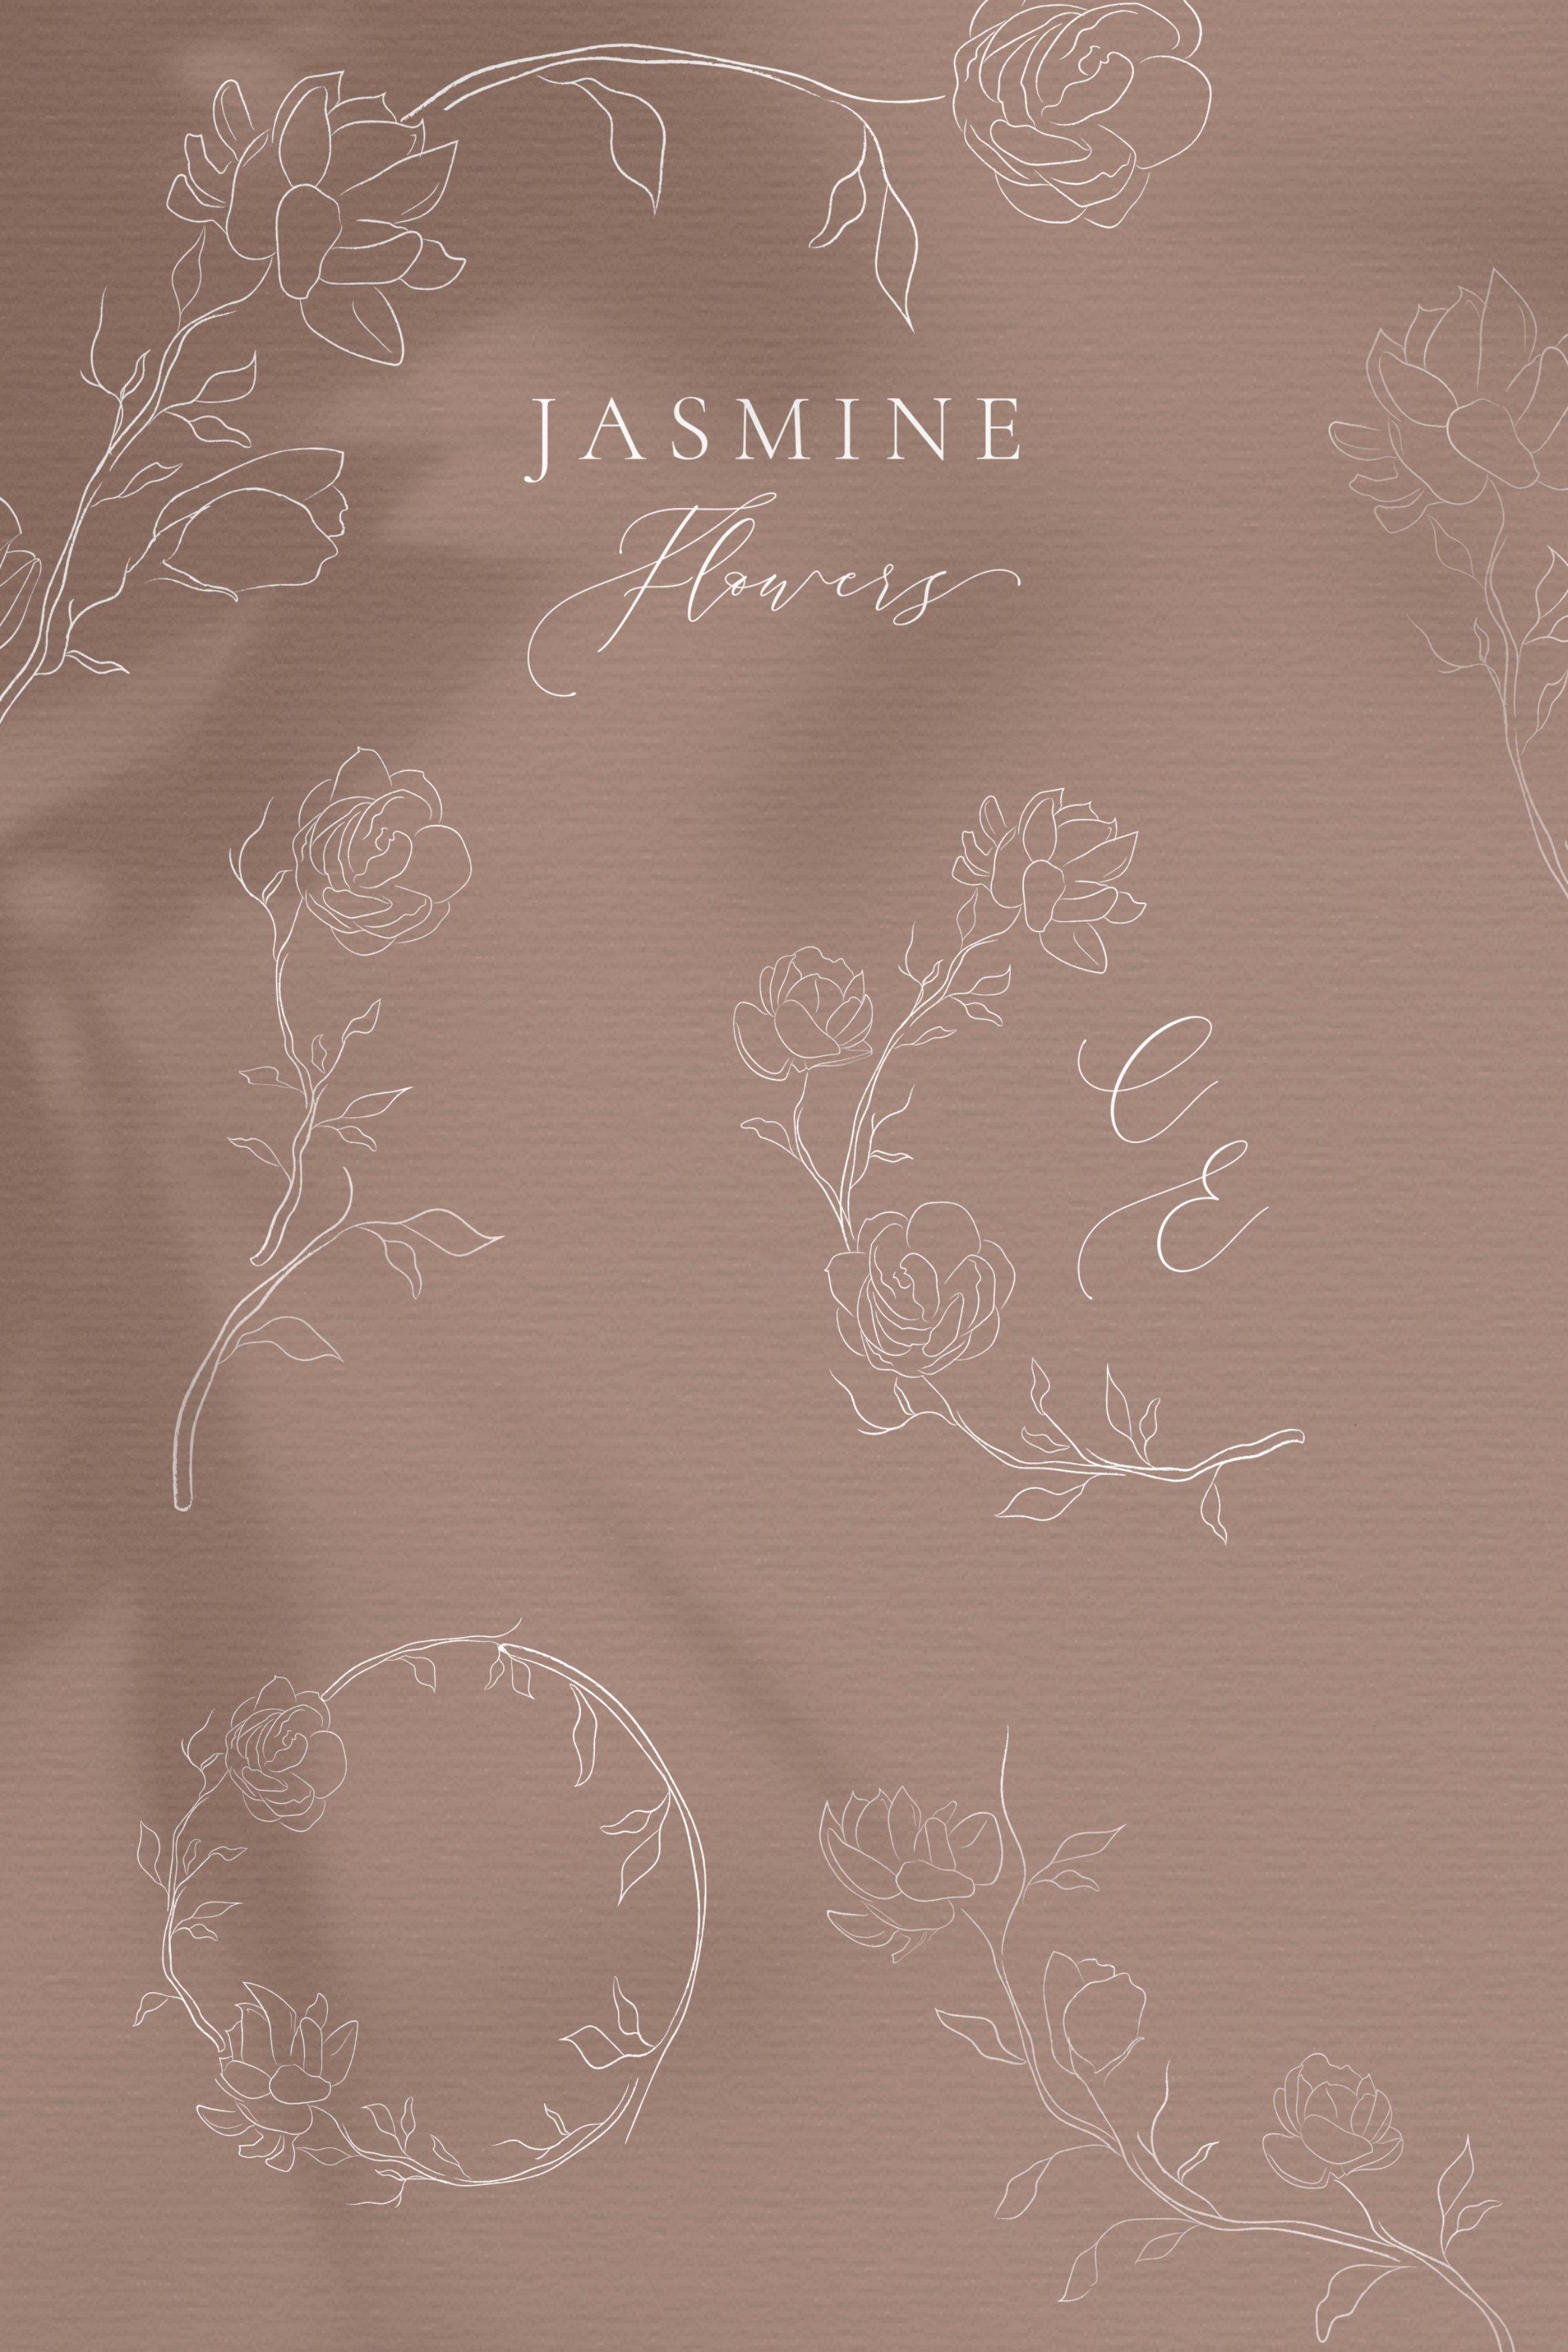 Line drawing White Jasmine Flower illustrations. Wreaths. example image 2